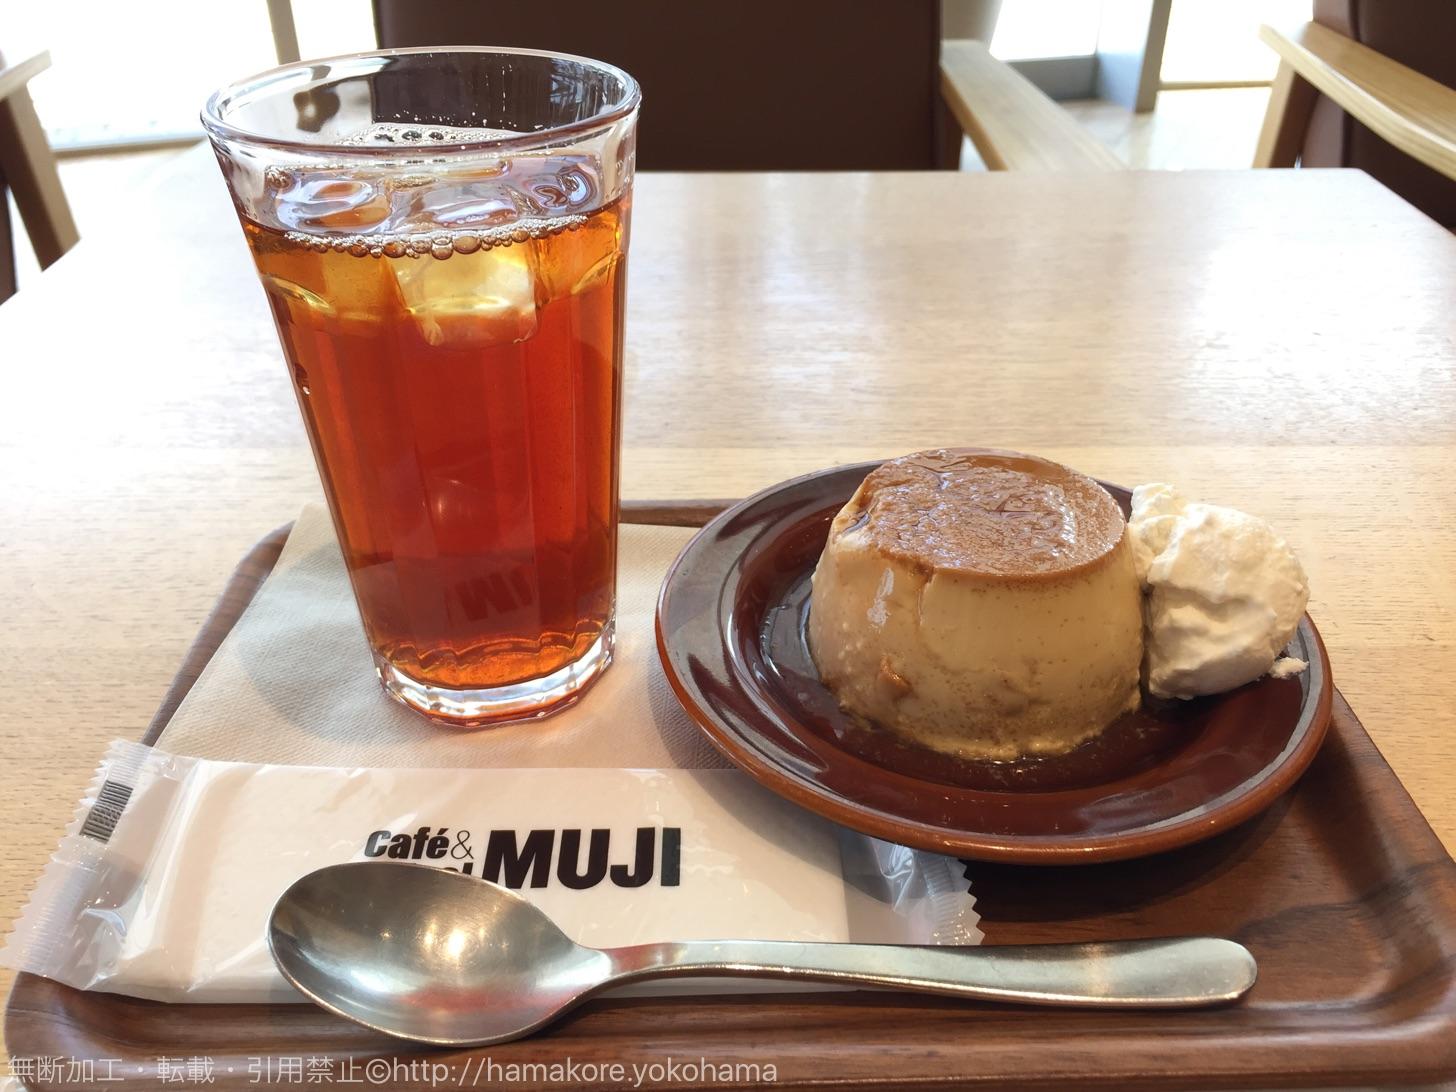 MUJIカフェ アイスティーとプリン